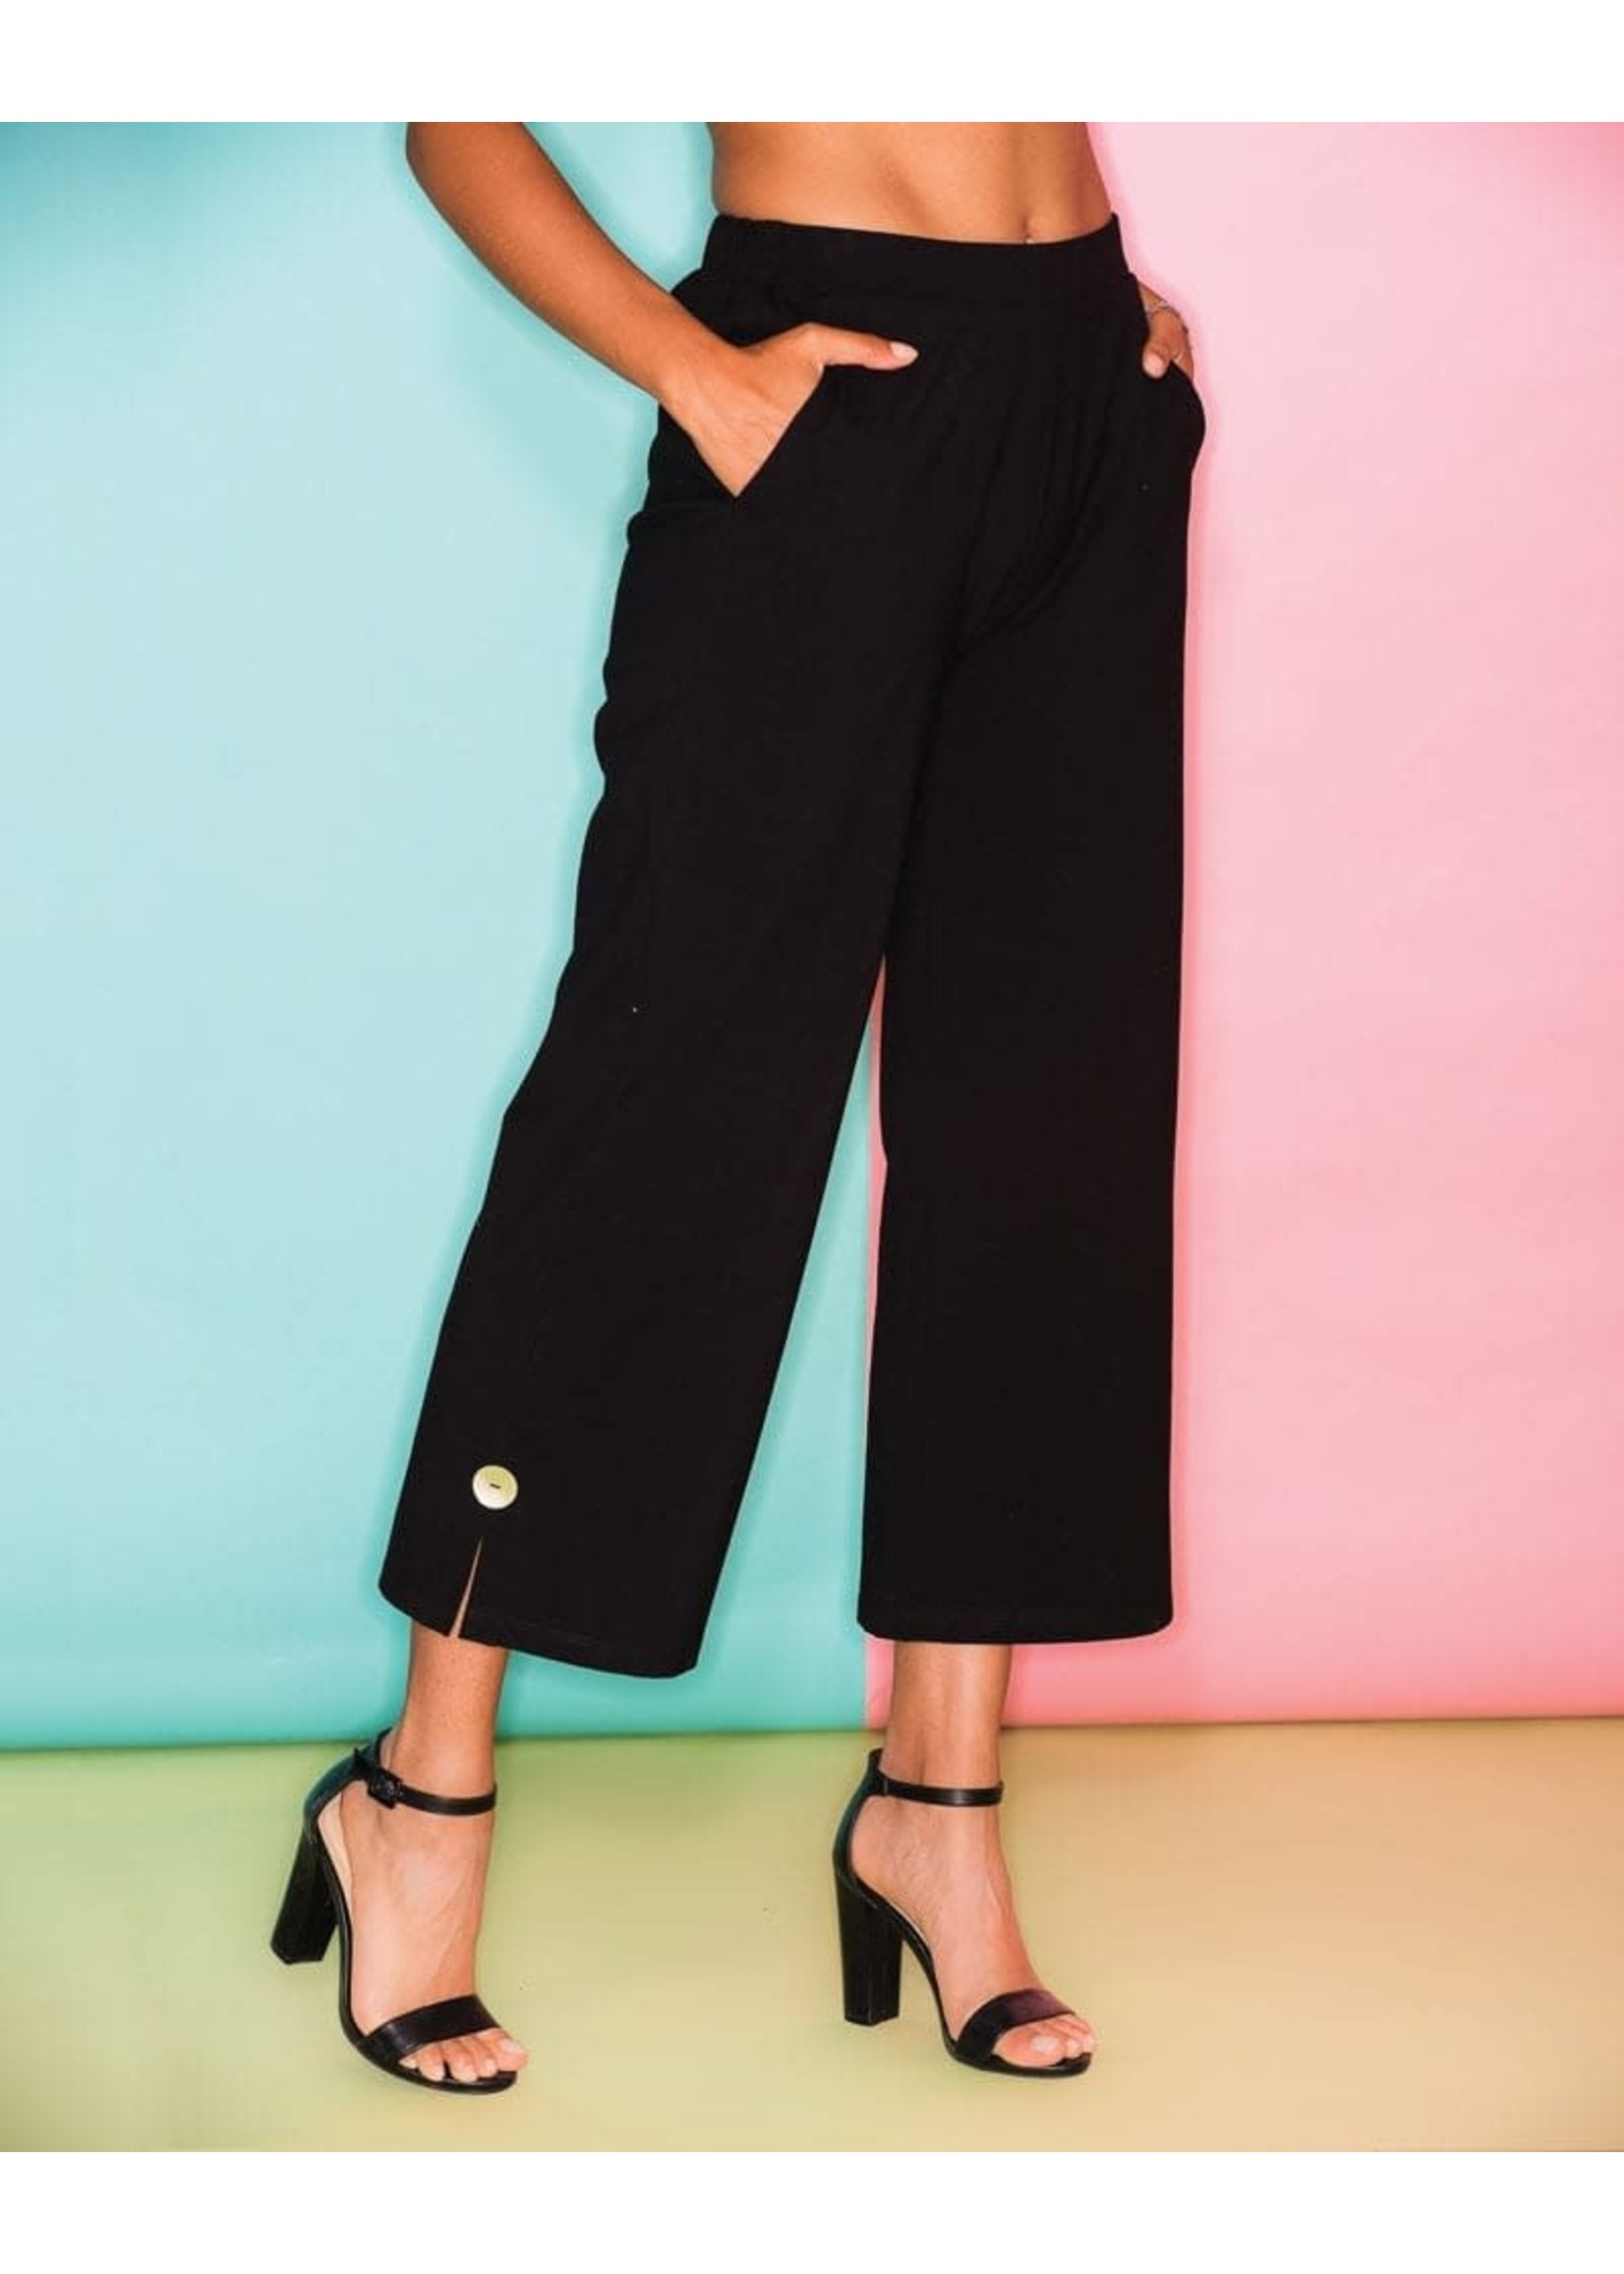 Elena Wang Black Knit Pant